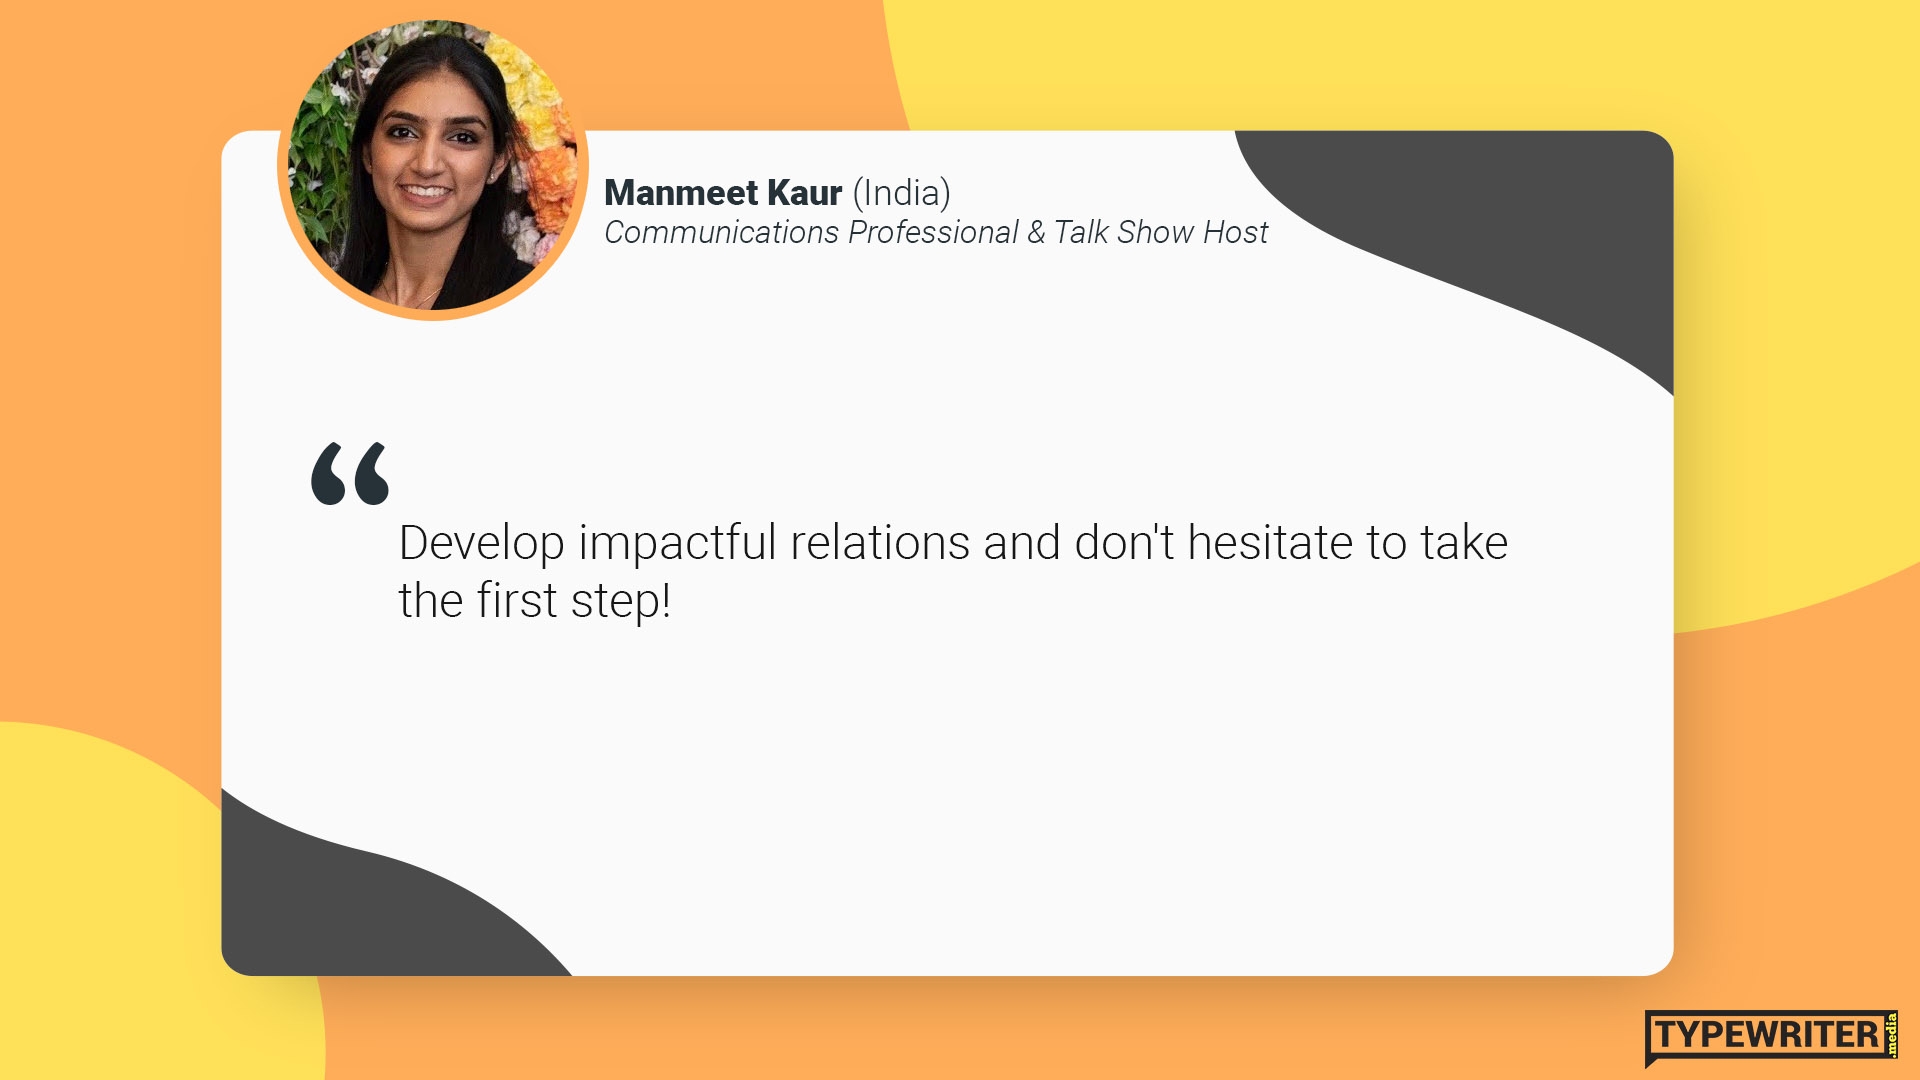 Manmeet's advice to international communications graduates